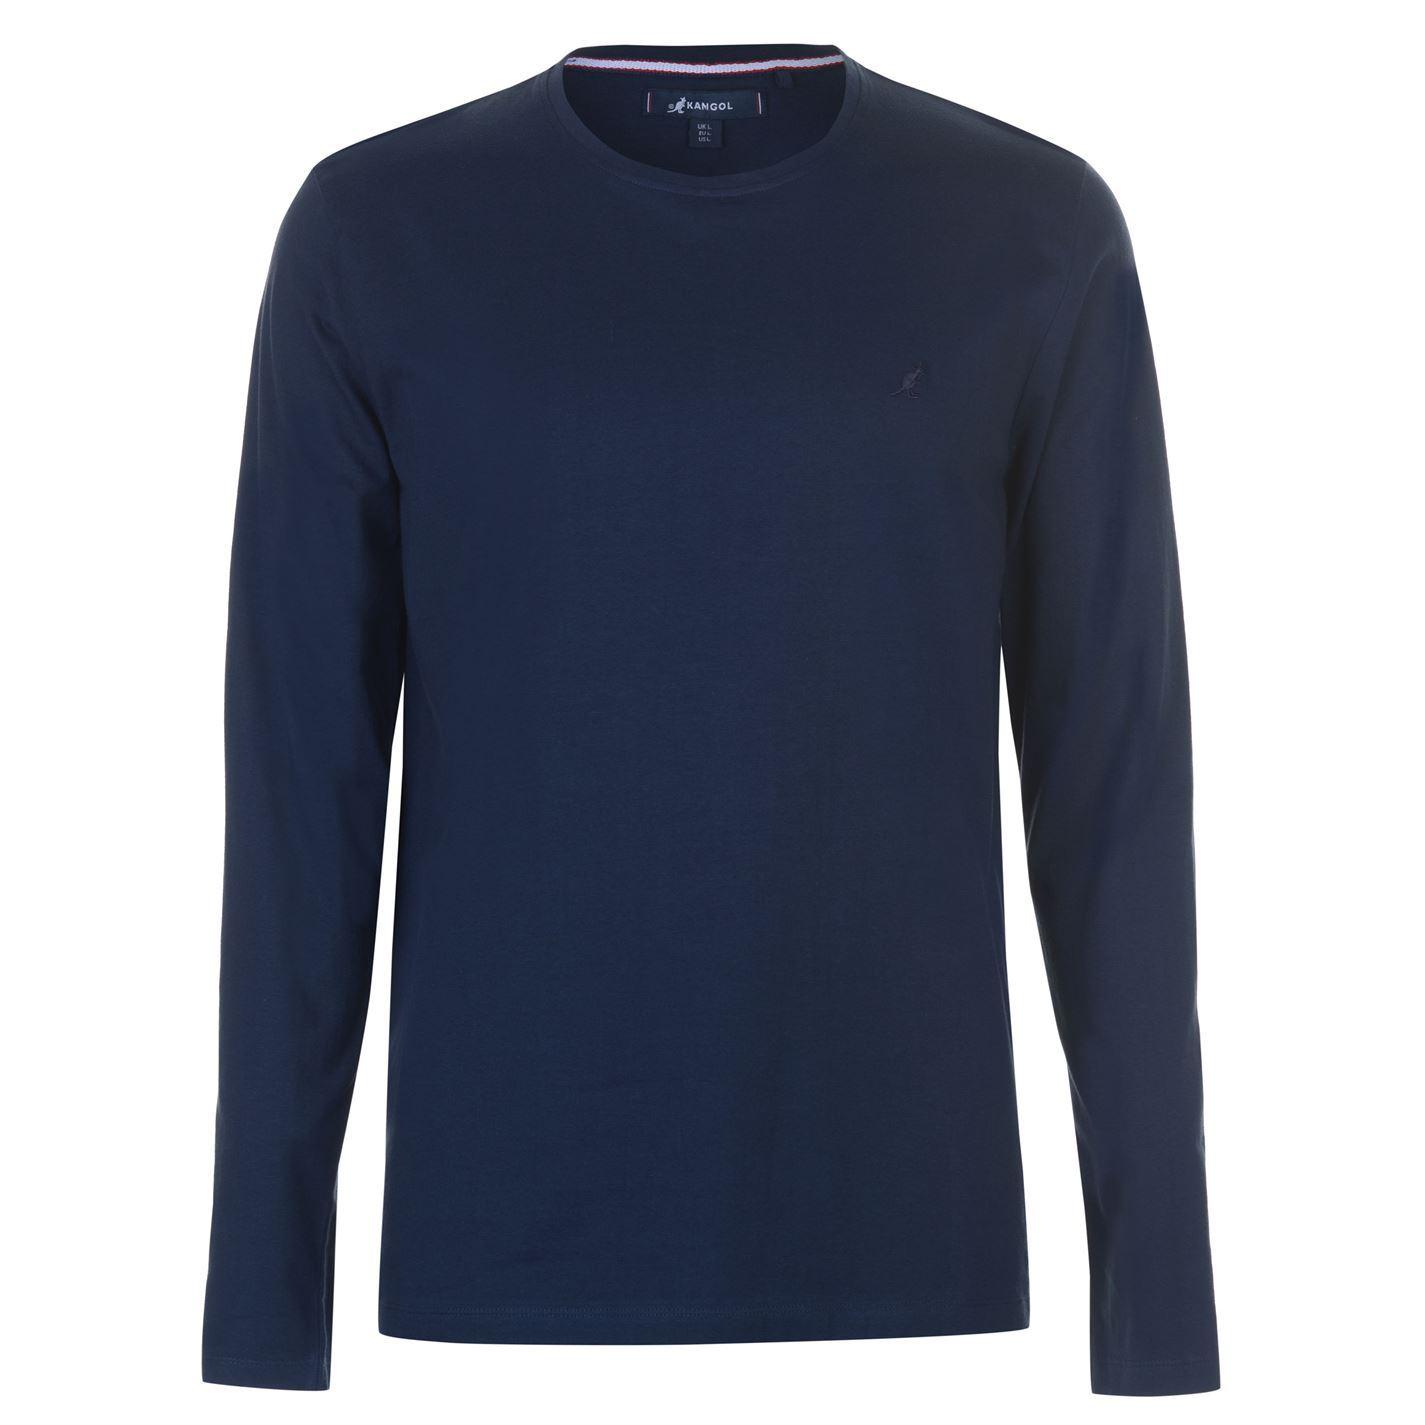 Kangol-Long-Sleeve-T-Shirt-Mens-Tee-Shirt-Top thumbnail 3